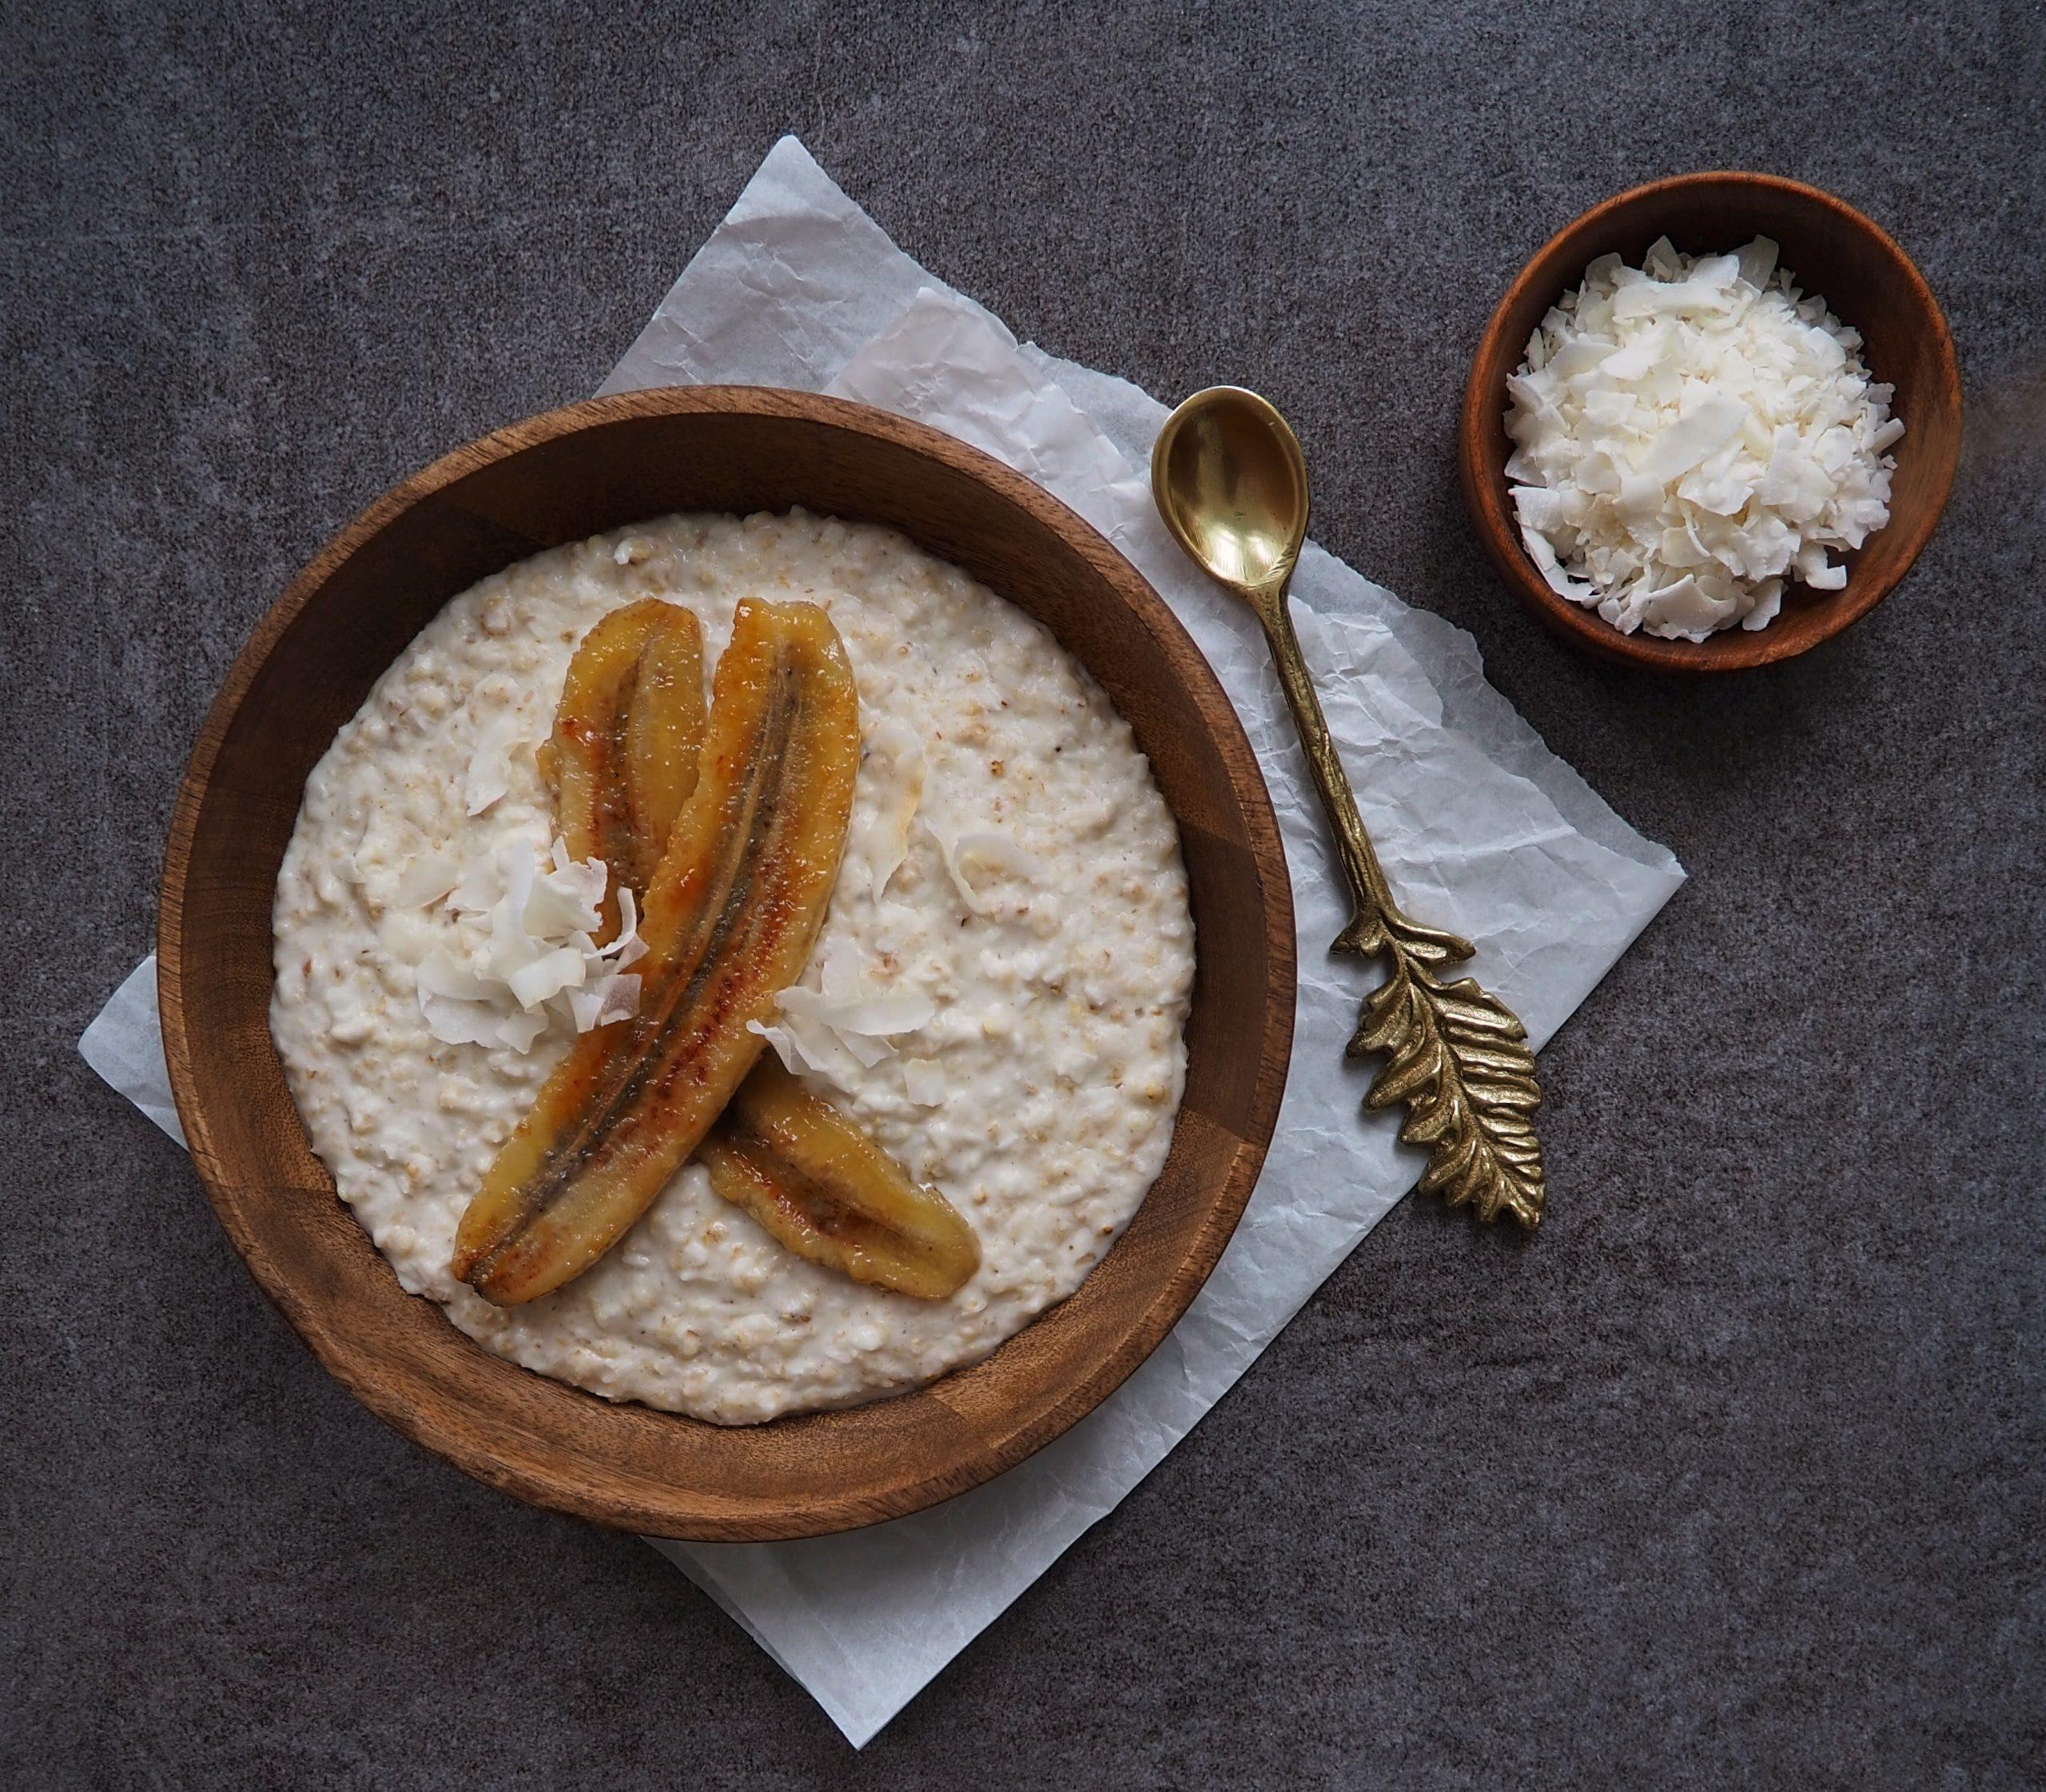 Kokos Porridge mit karamellisierter Banane